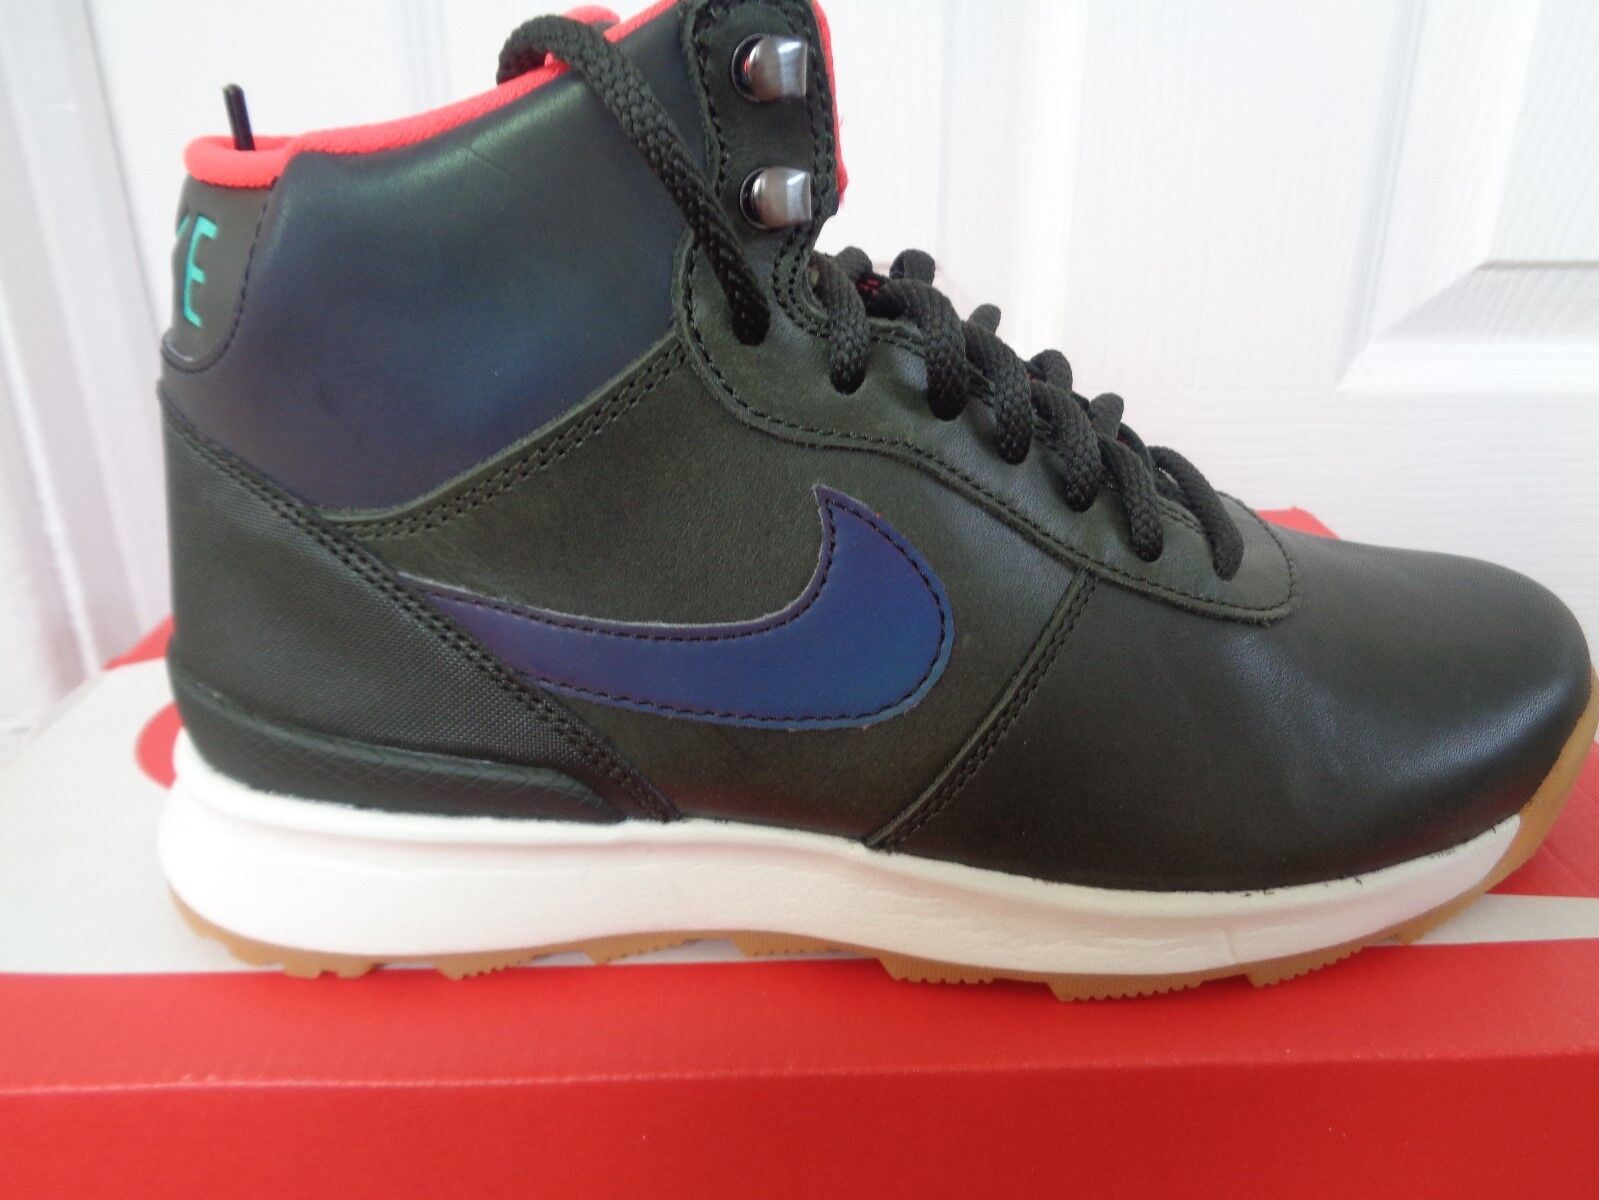 93b6e7ce1c Nike wmns Accora RFLCT trainers shoes boots 807151 336 eu 38 us 7 NEW+BOX